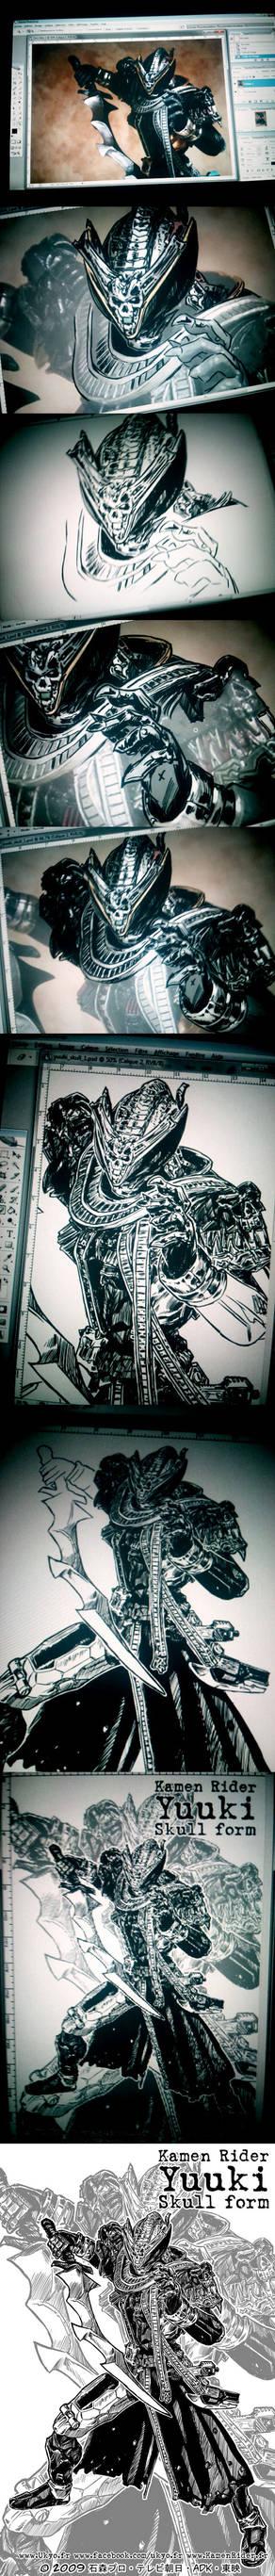 SIC Kamen Rider Yuuki - Step by Step by Uky0